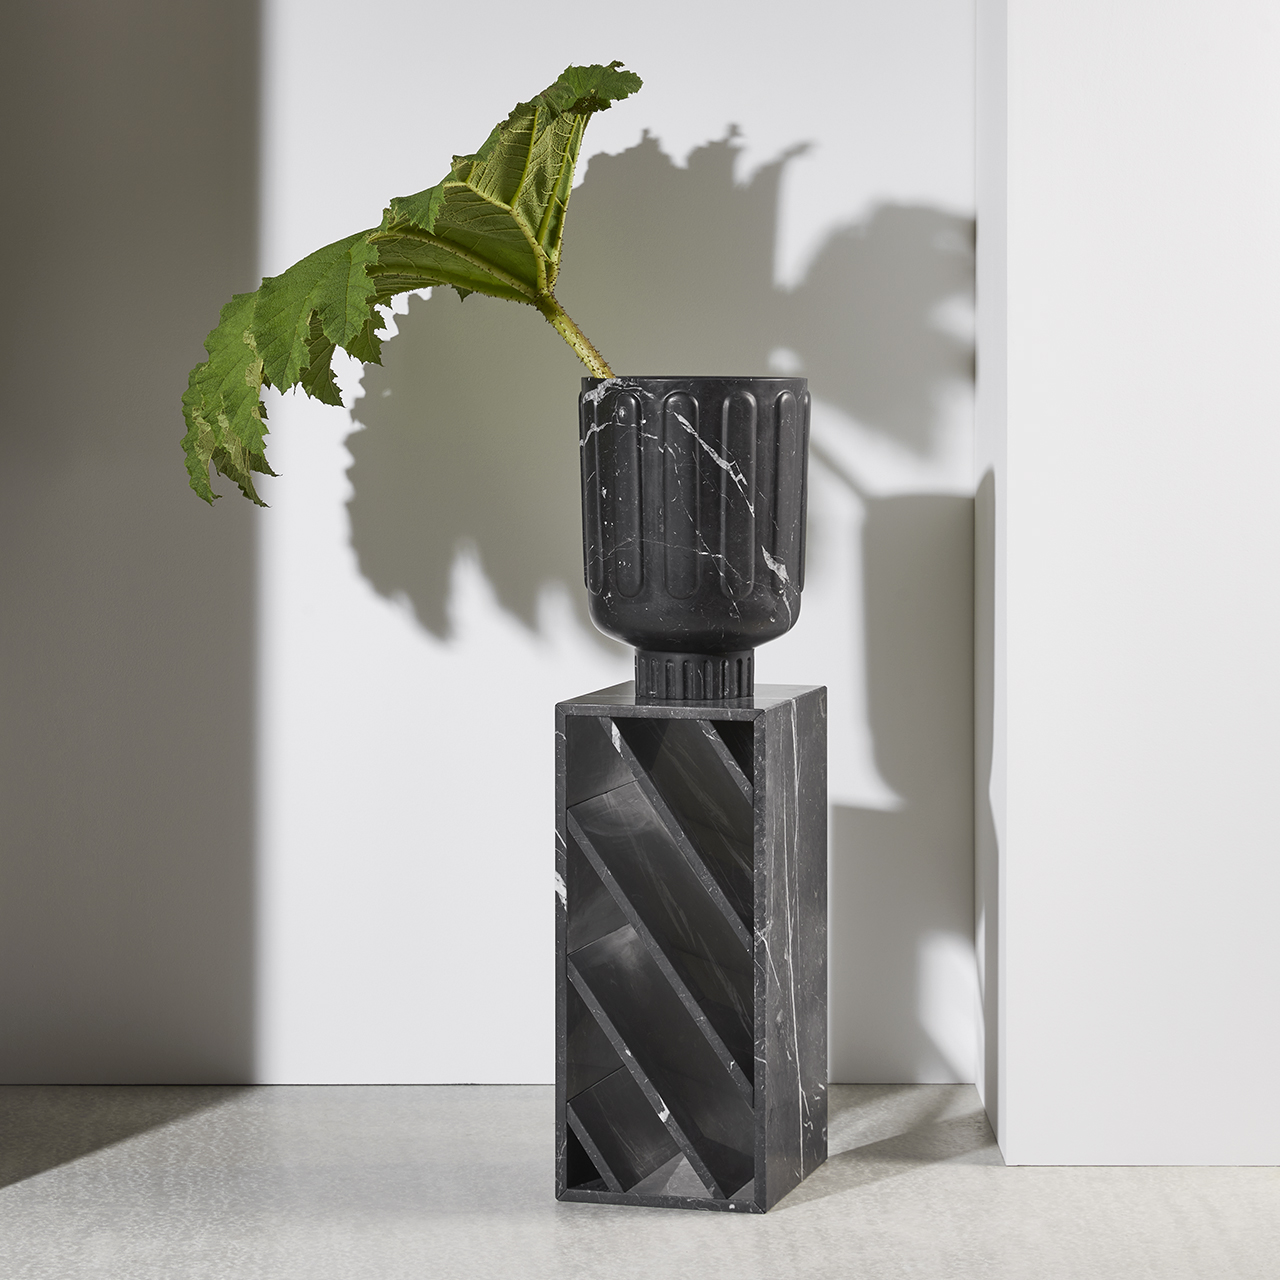 Brick-side-table-marble-Gregoire-de-lafforest-Collection-particuliere1